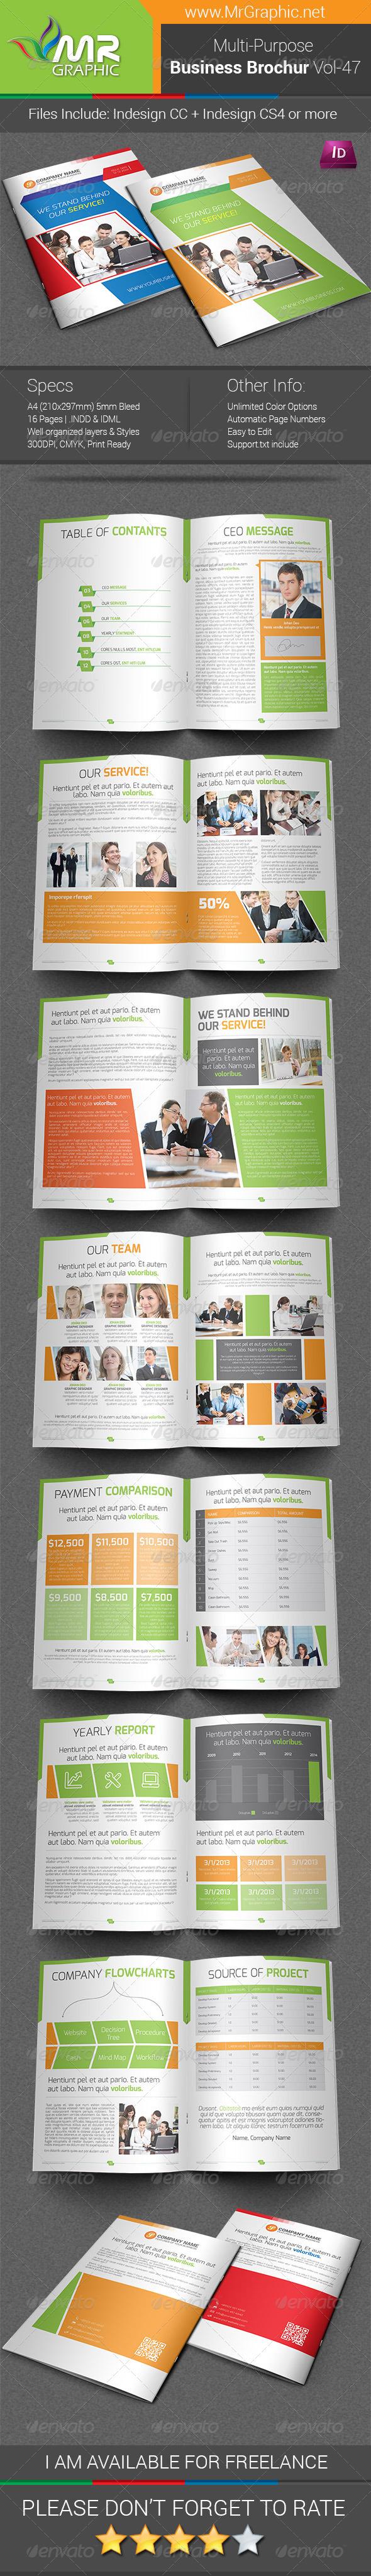 Multipurpose Business Brochure Template Vol-47 - Corporate Brochures